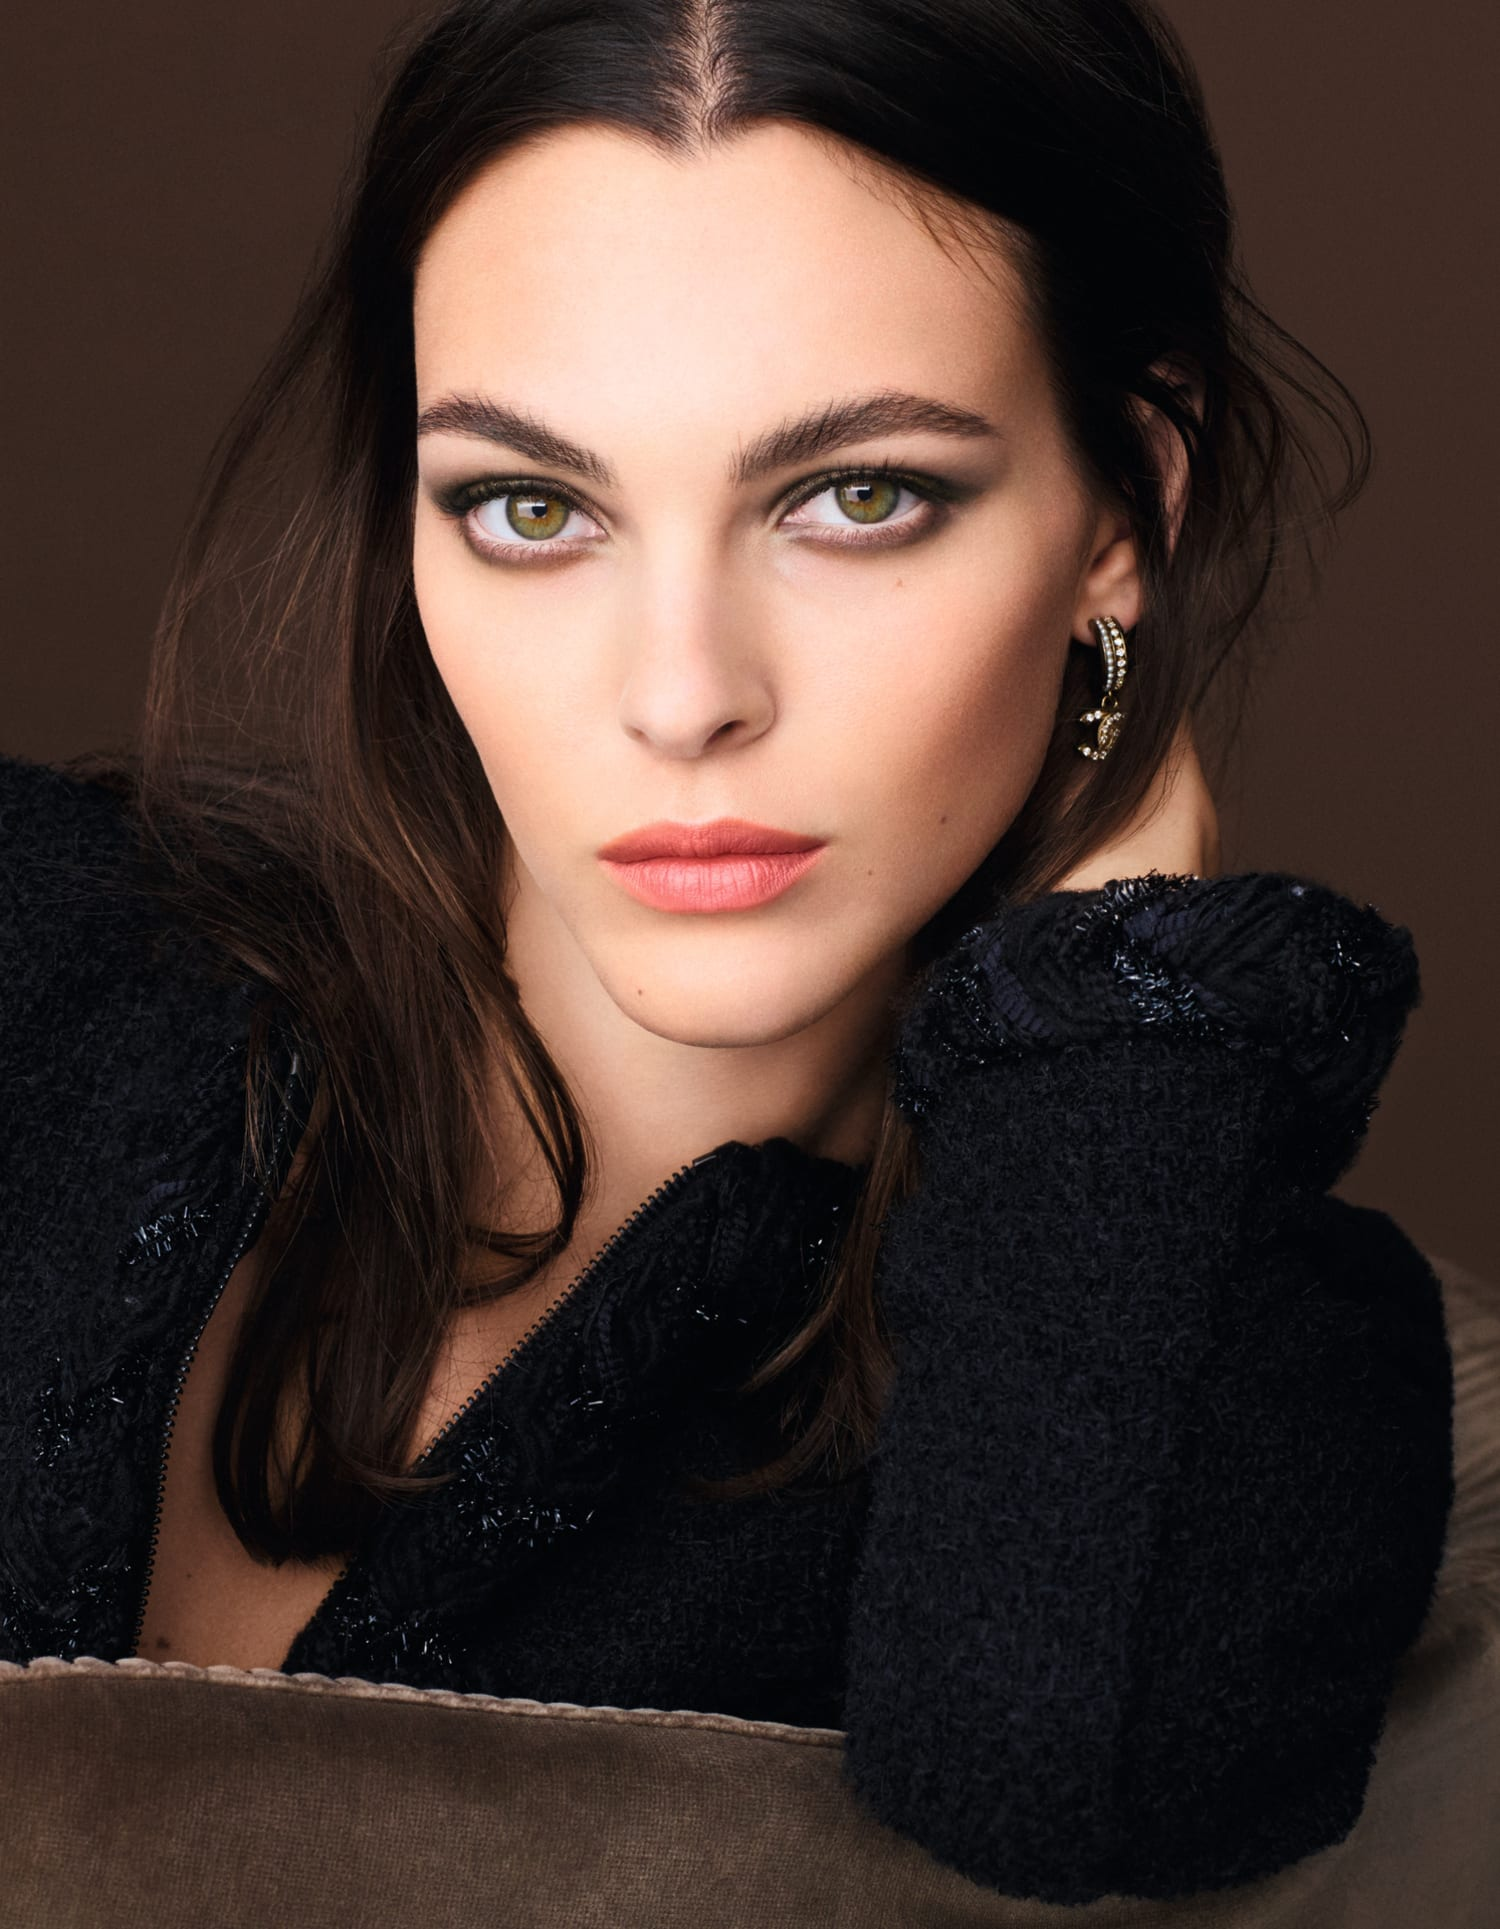 Chanel_FW21_Makeup_Fashionela (1)